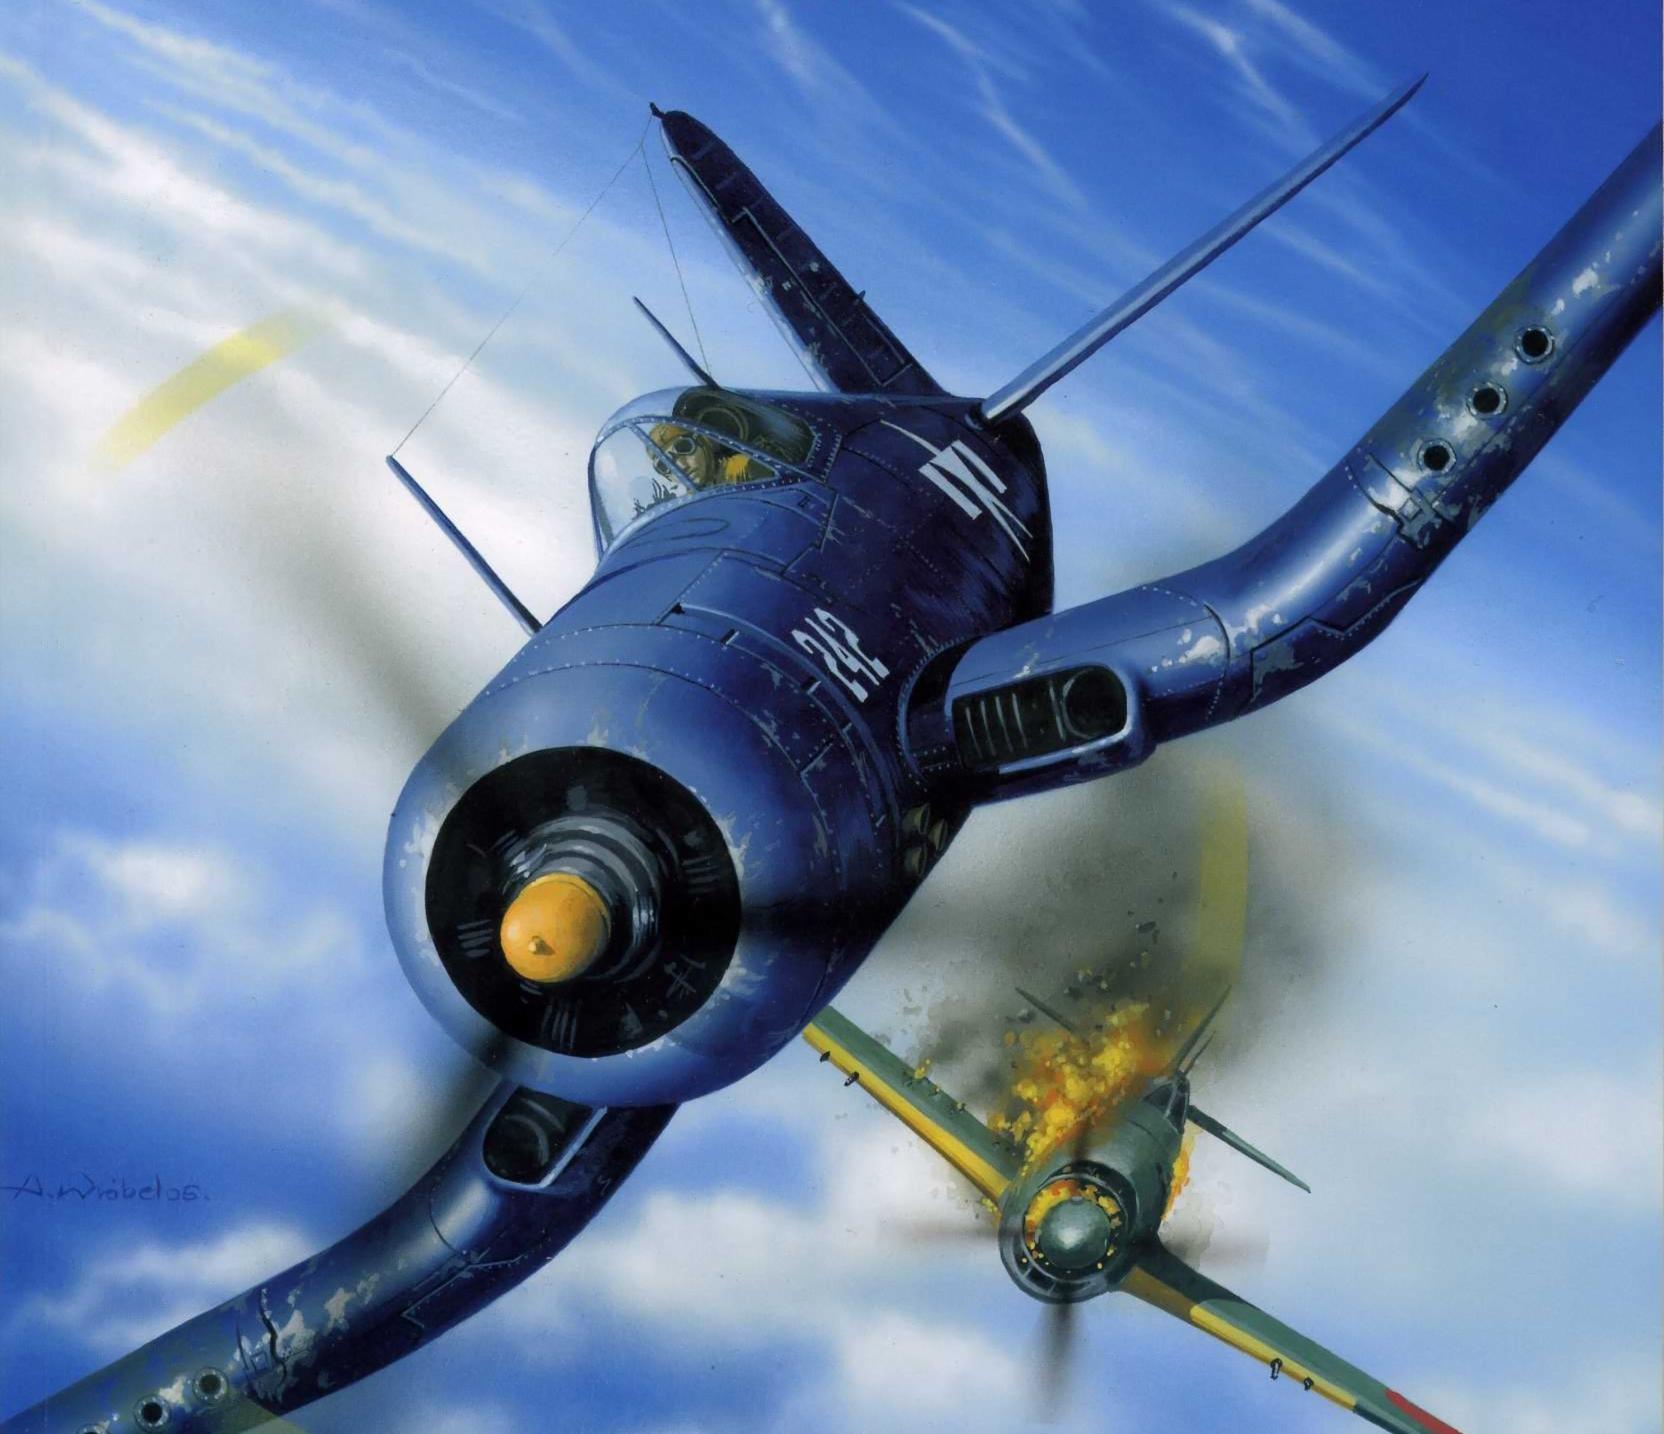 Wróbel Arkadiusz. Истребитель Chance Vought F-4U Corsair.